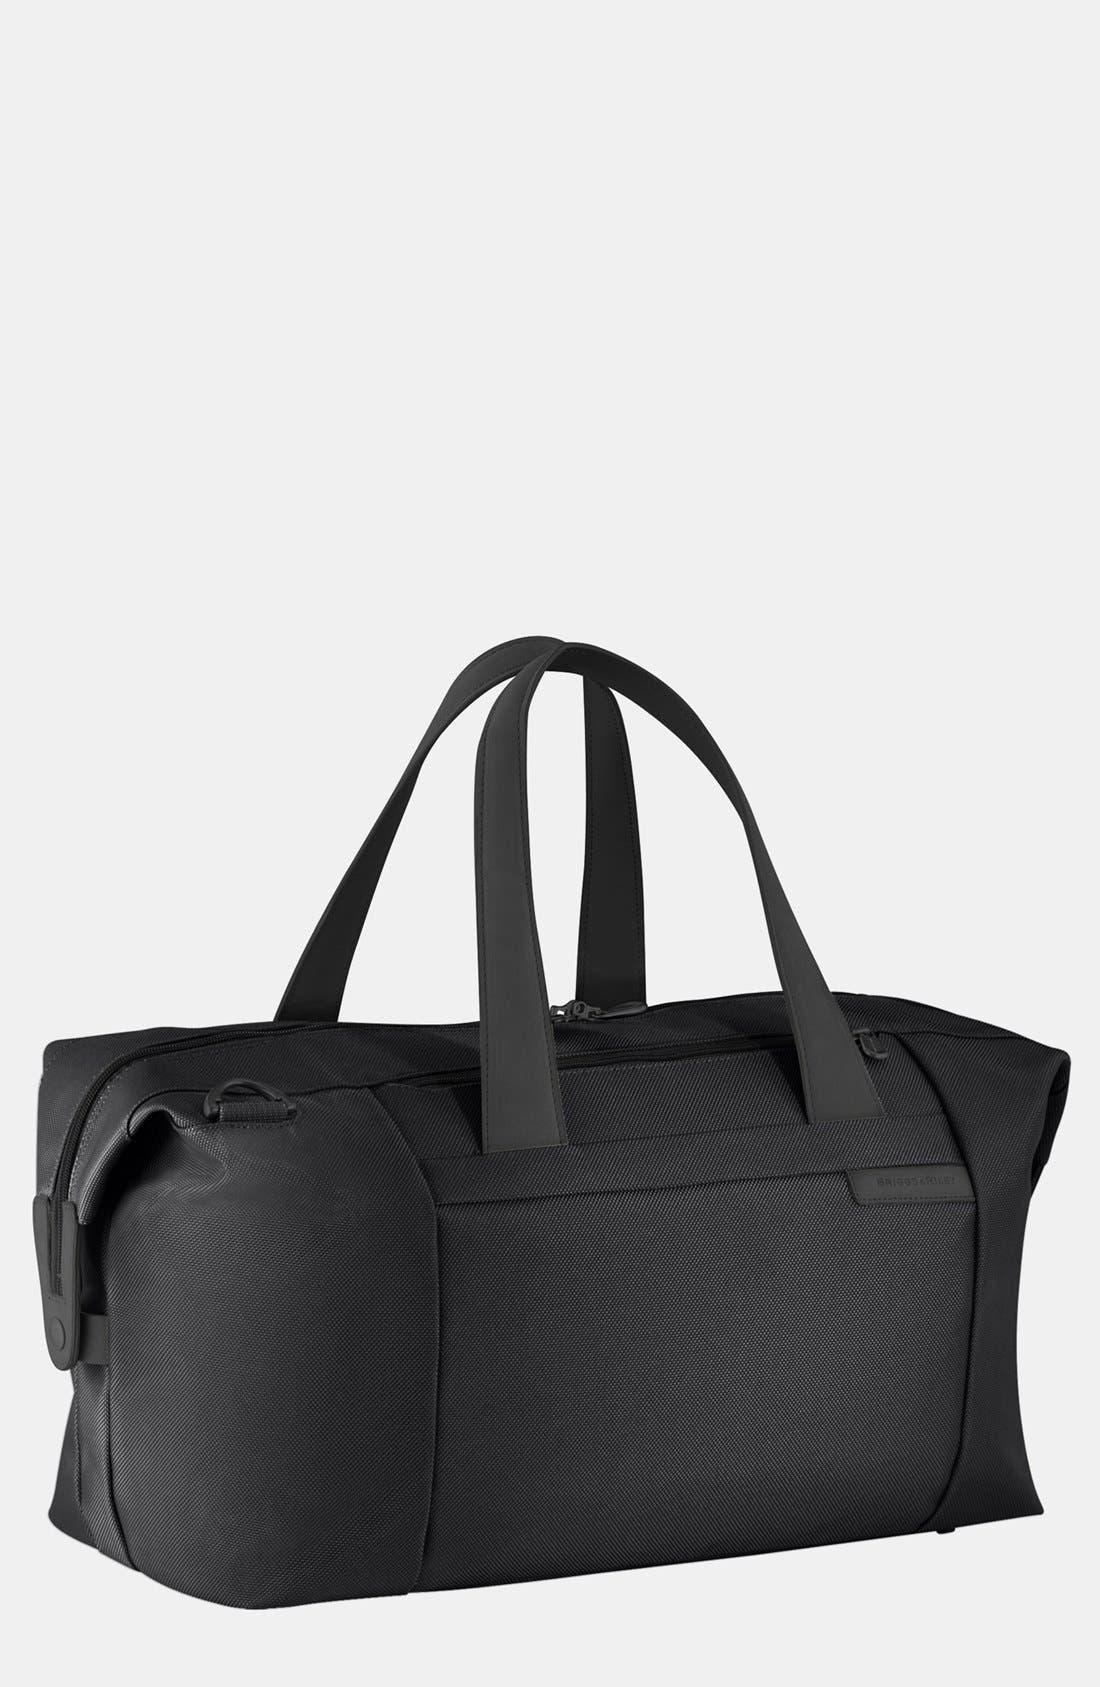 Main Image - Briggs & Riley 'Baseline' Duffel Bag (19 Inch)